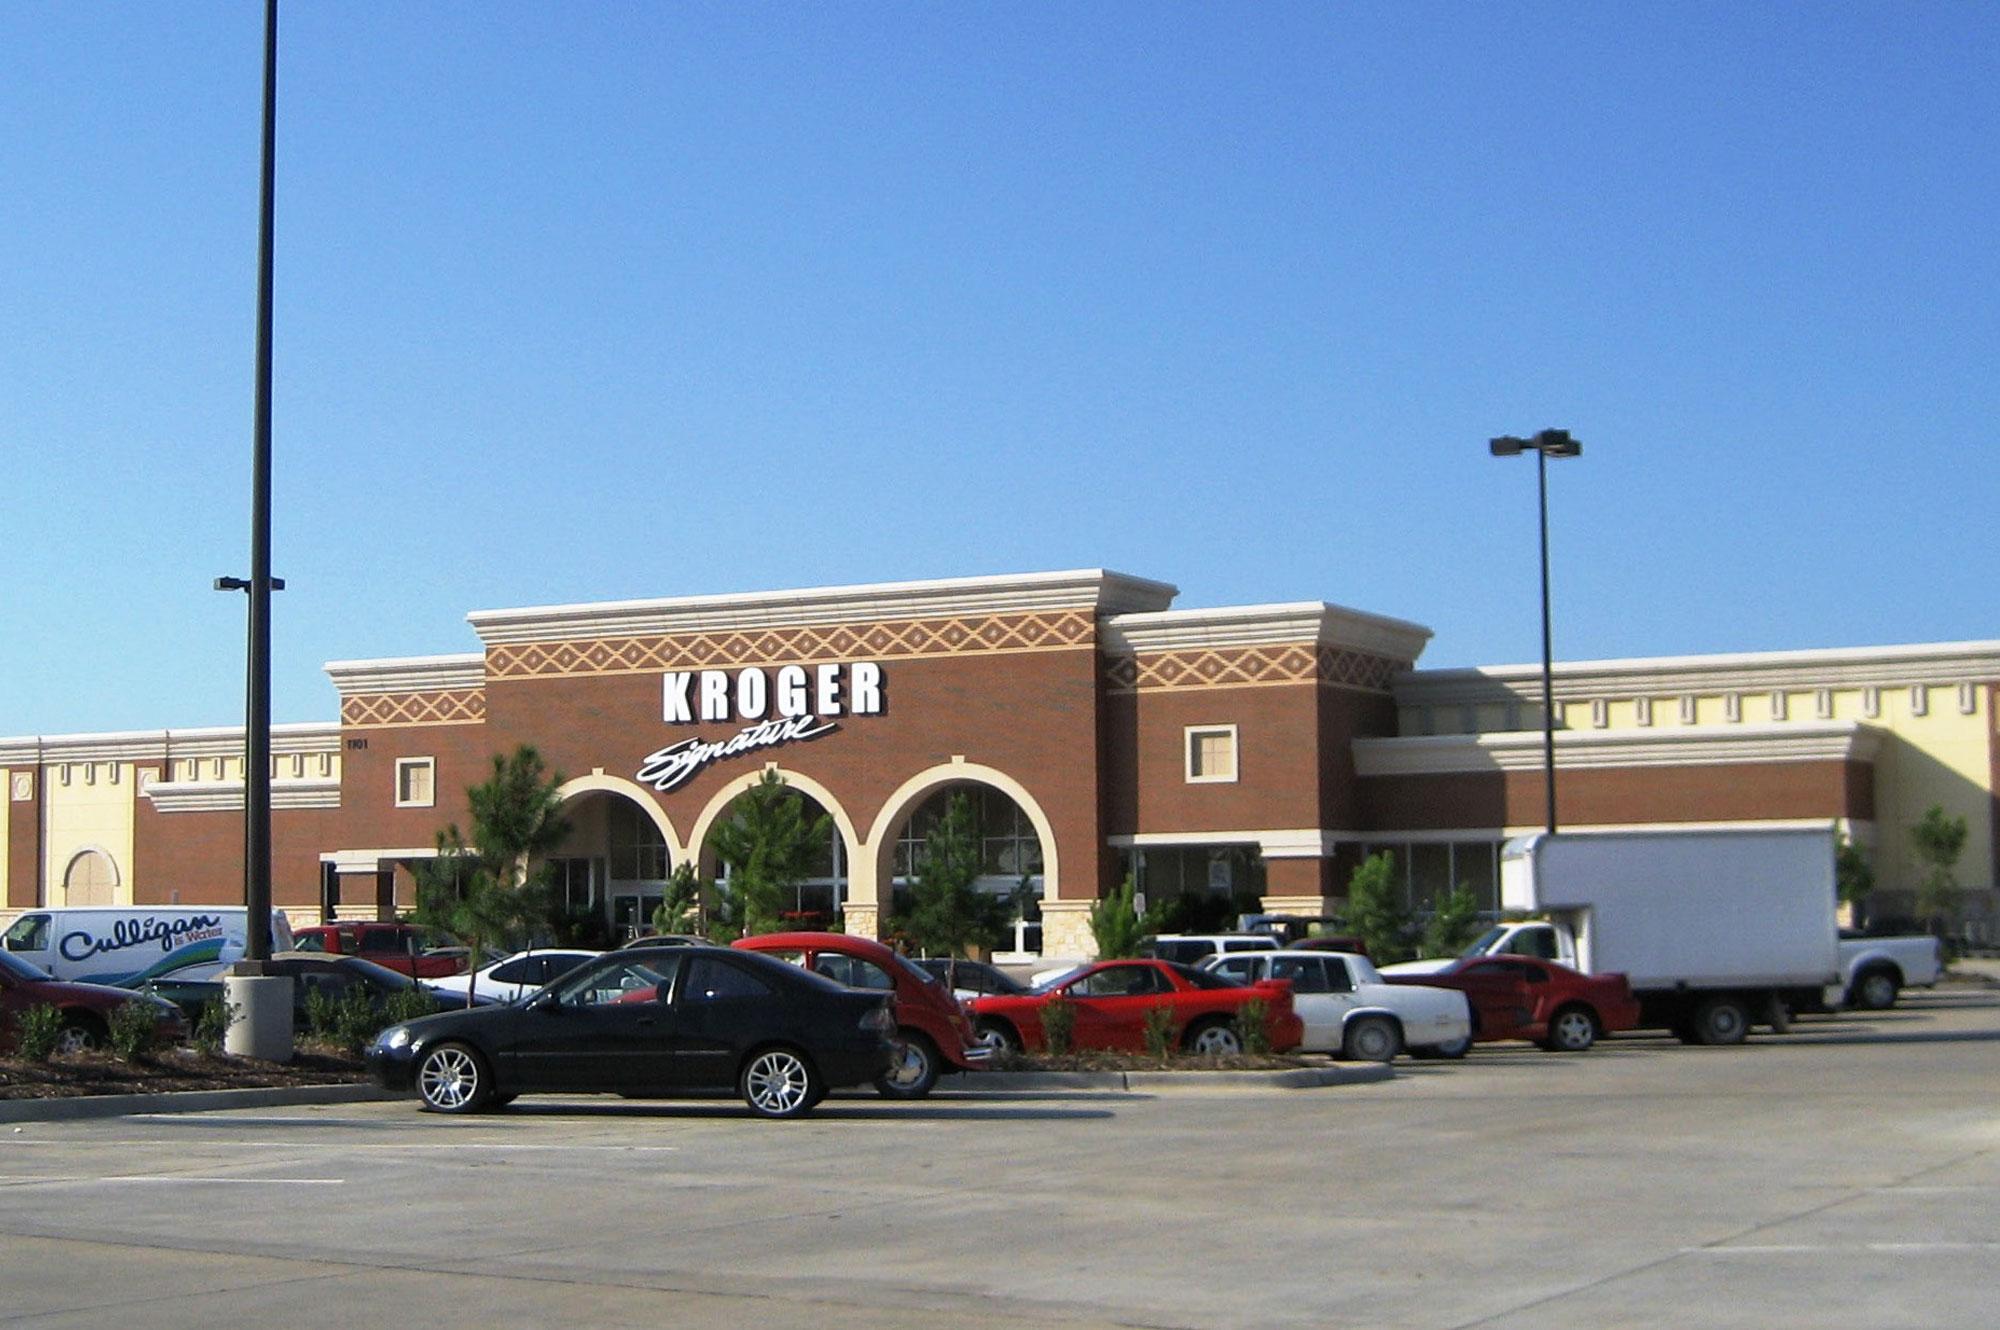 Kroger - Flower Mound, TX - Yelp